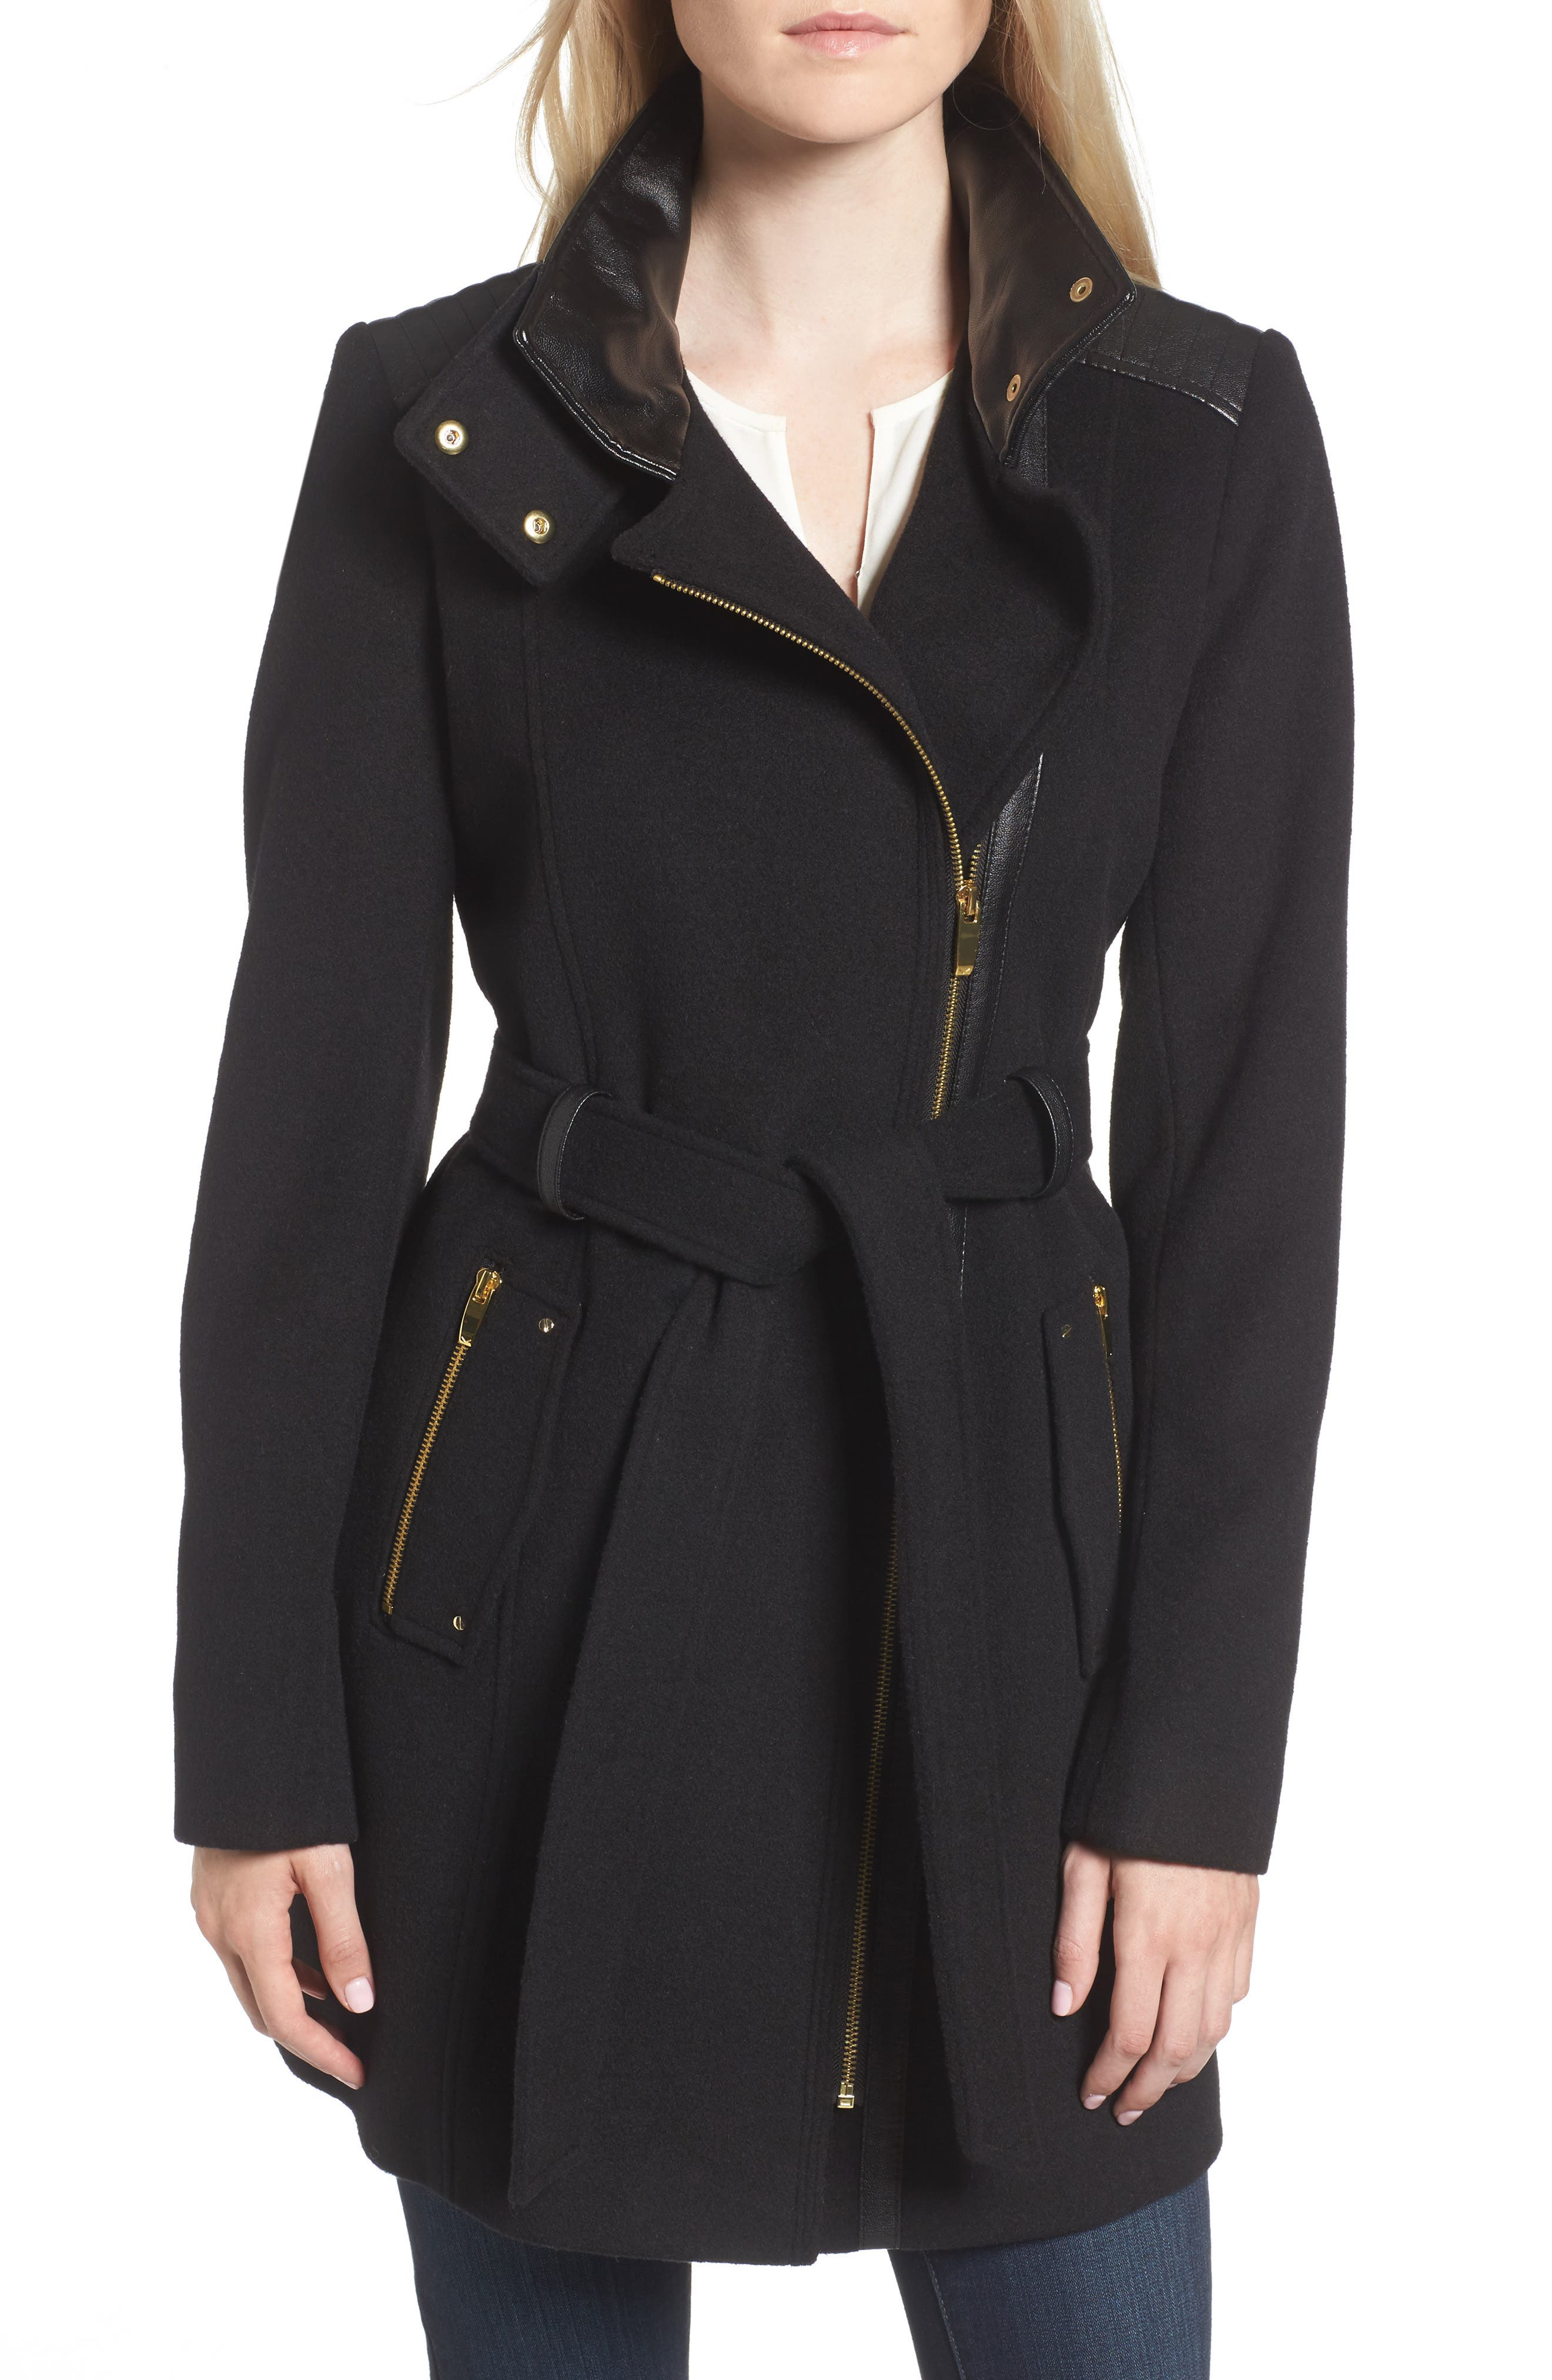 Alternate Image 1 Selected - Via Spiga Wool Blend Coat